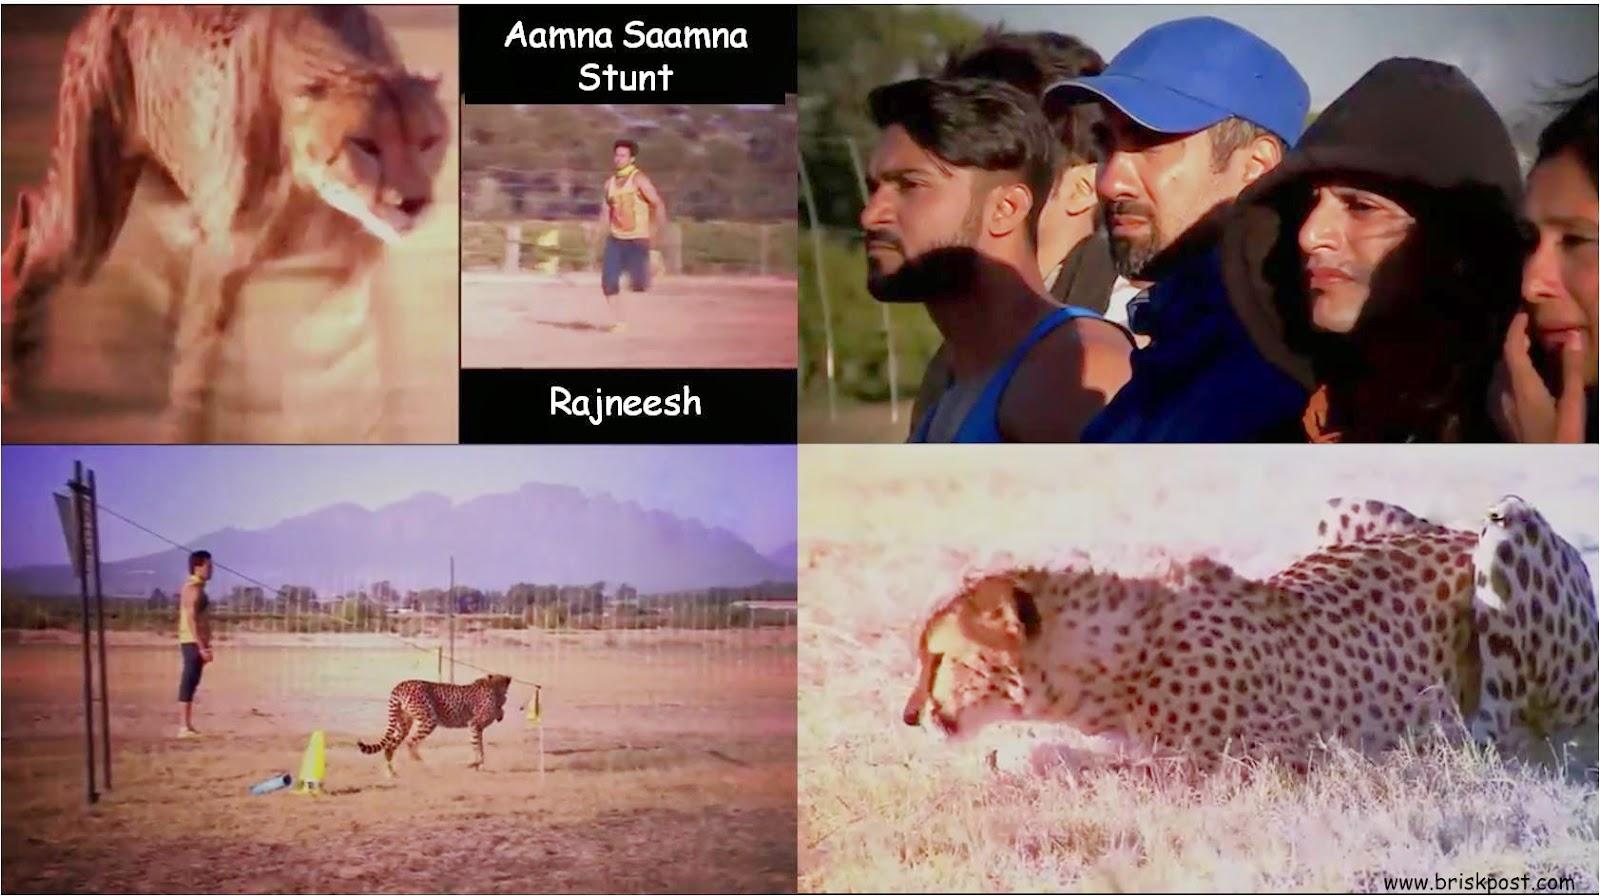 Rajneesh running to face tiger during Fear Factor Khatron Ke Khiladi stunt